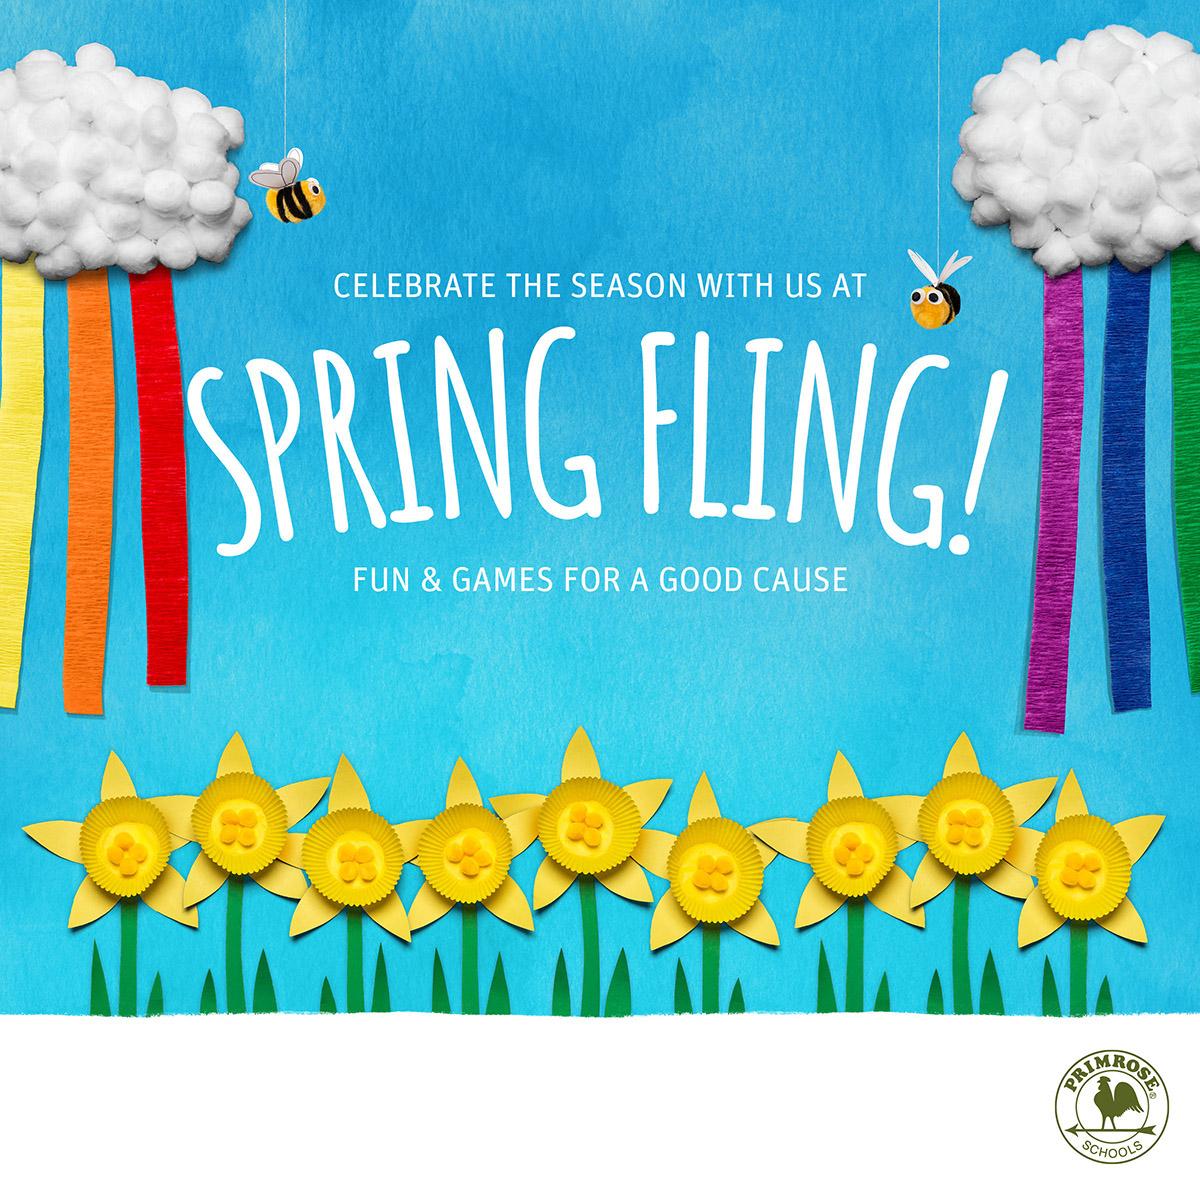 Spring Fling is April 27th